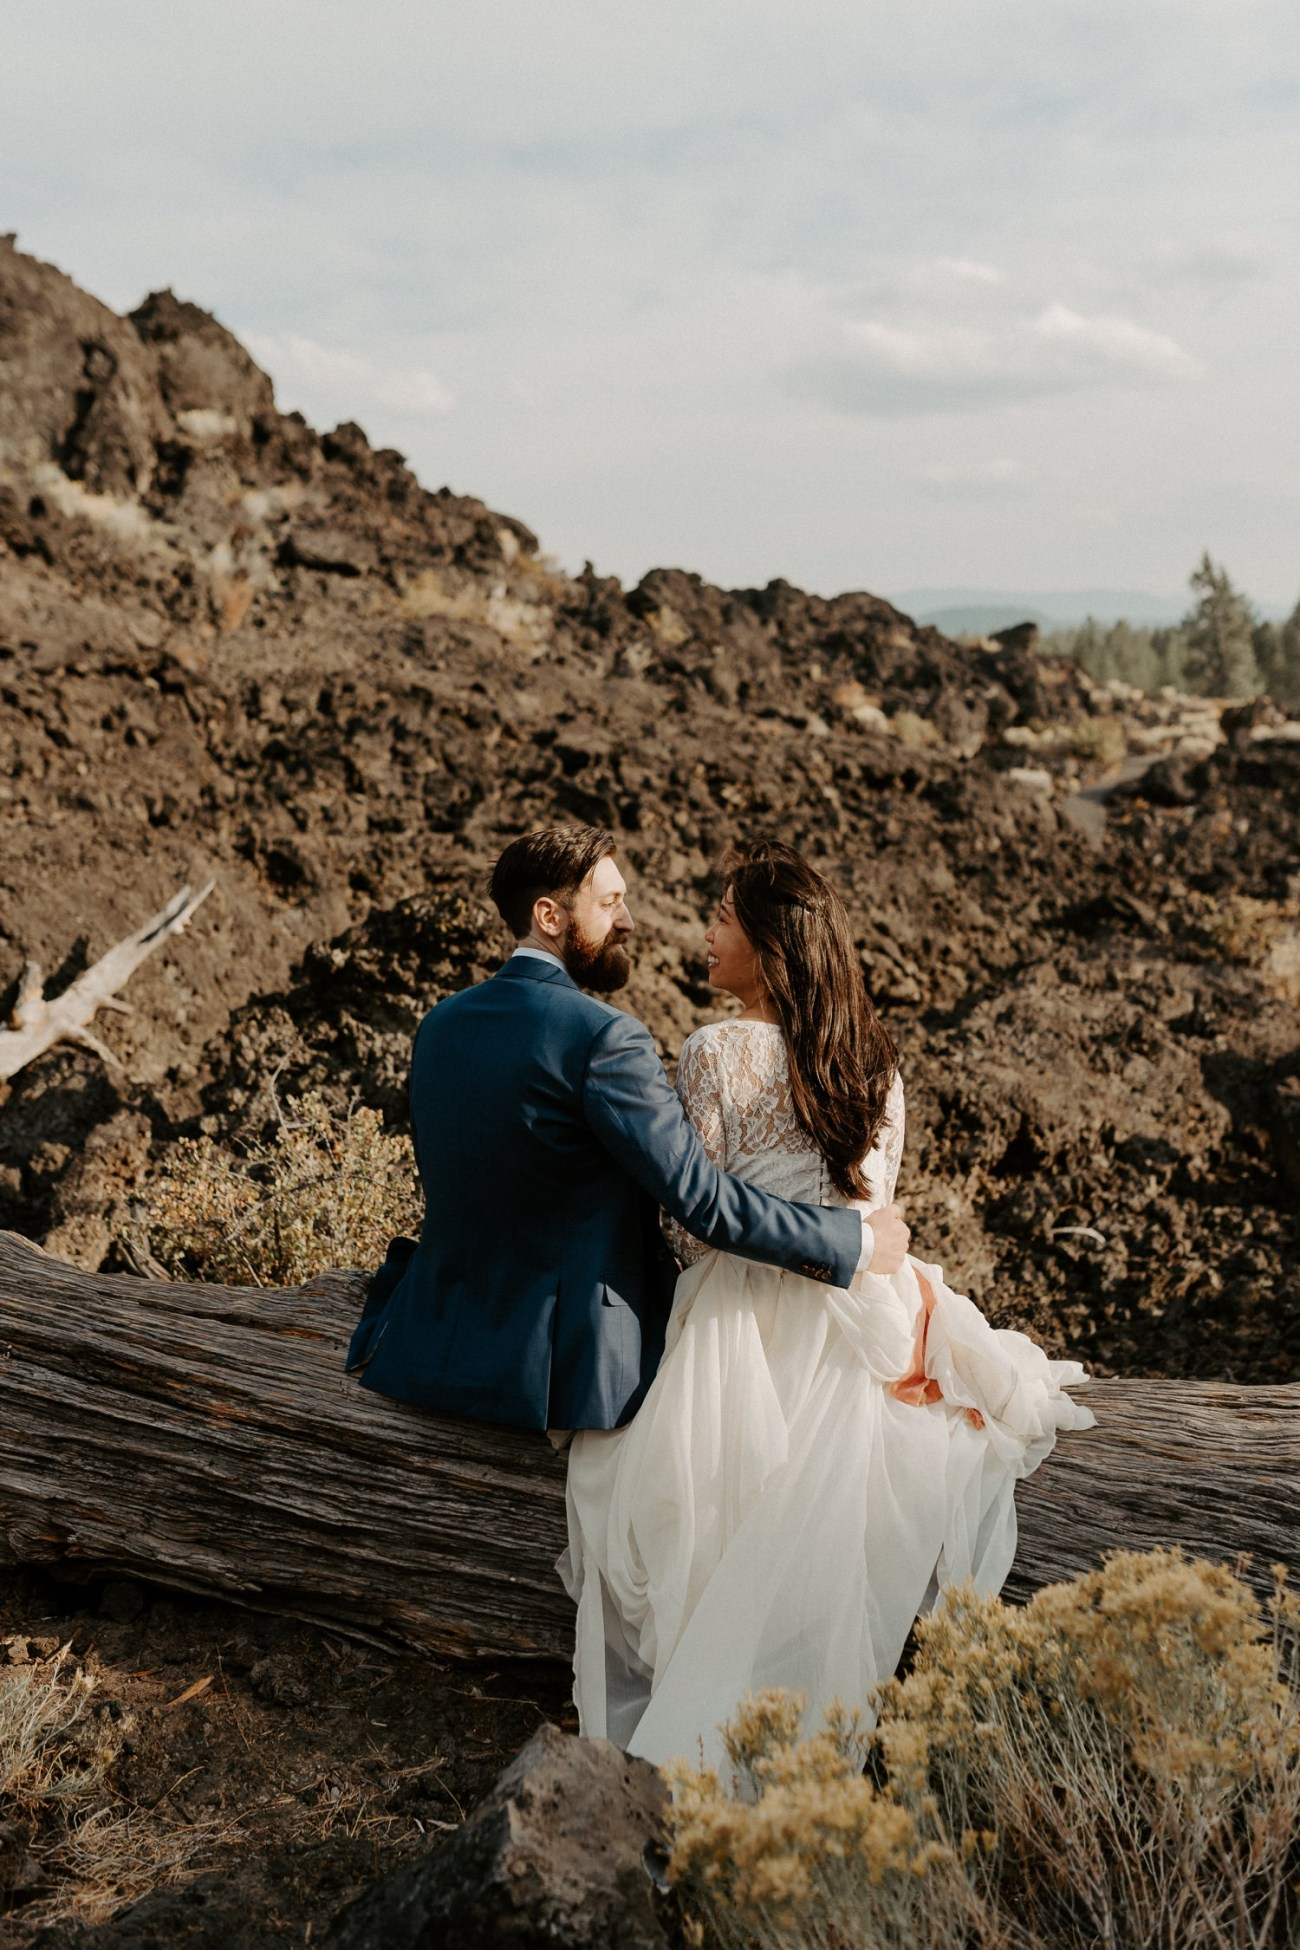 Newberry Volcano Elopement Bend Elopement Bridal Session Bend Wedding Photographer Anais Possamai Photography 018